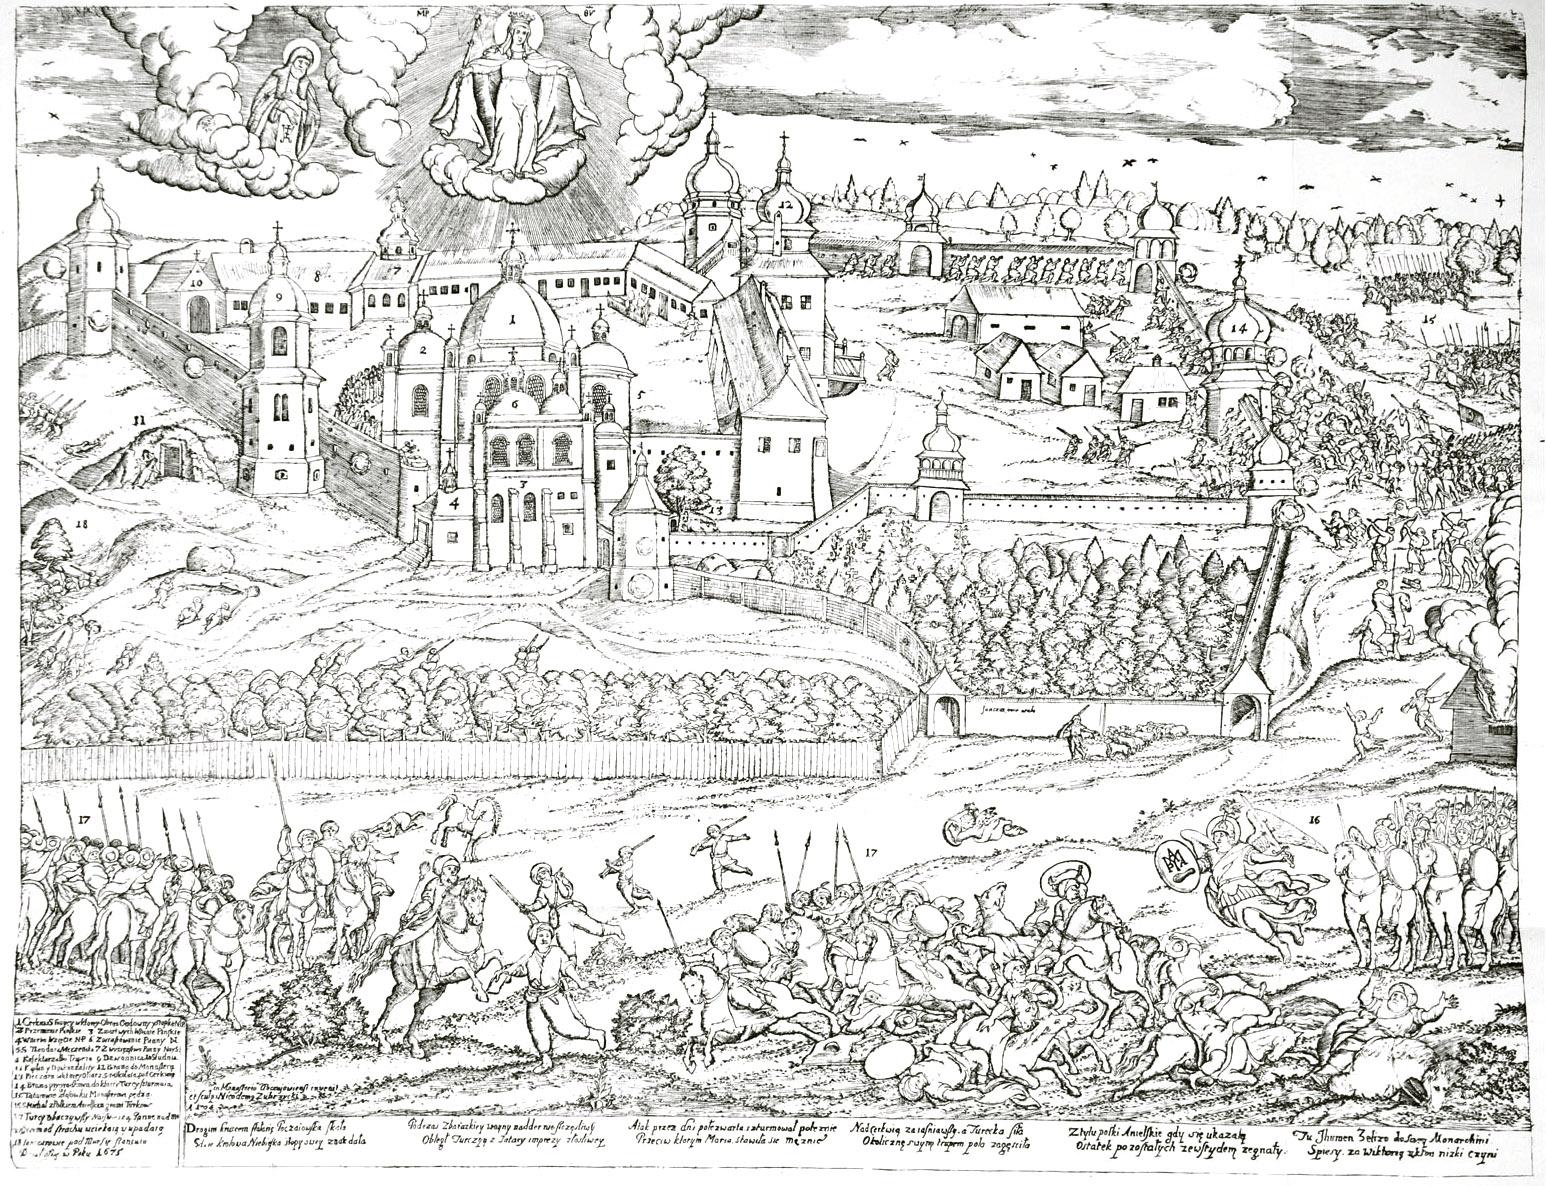 36. ������������ ���������� ����� �� �����, ������� ����������� ������ �������� �����������, 1704 ����.